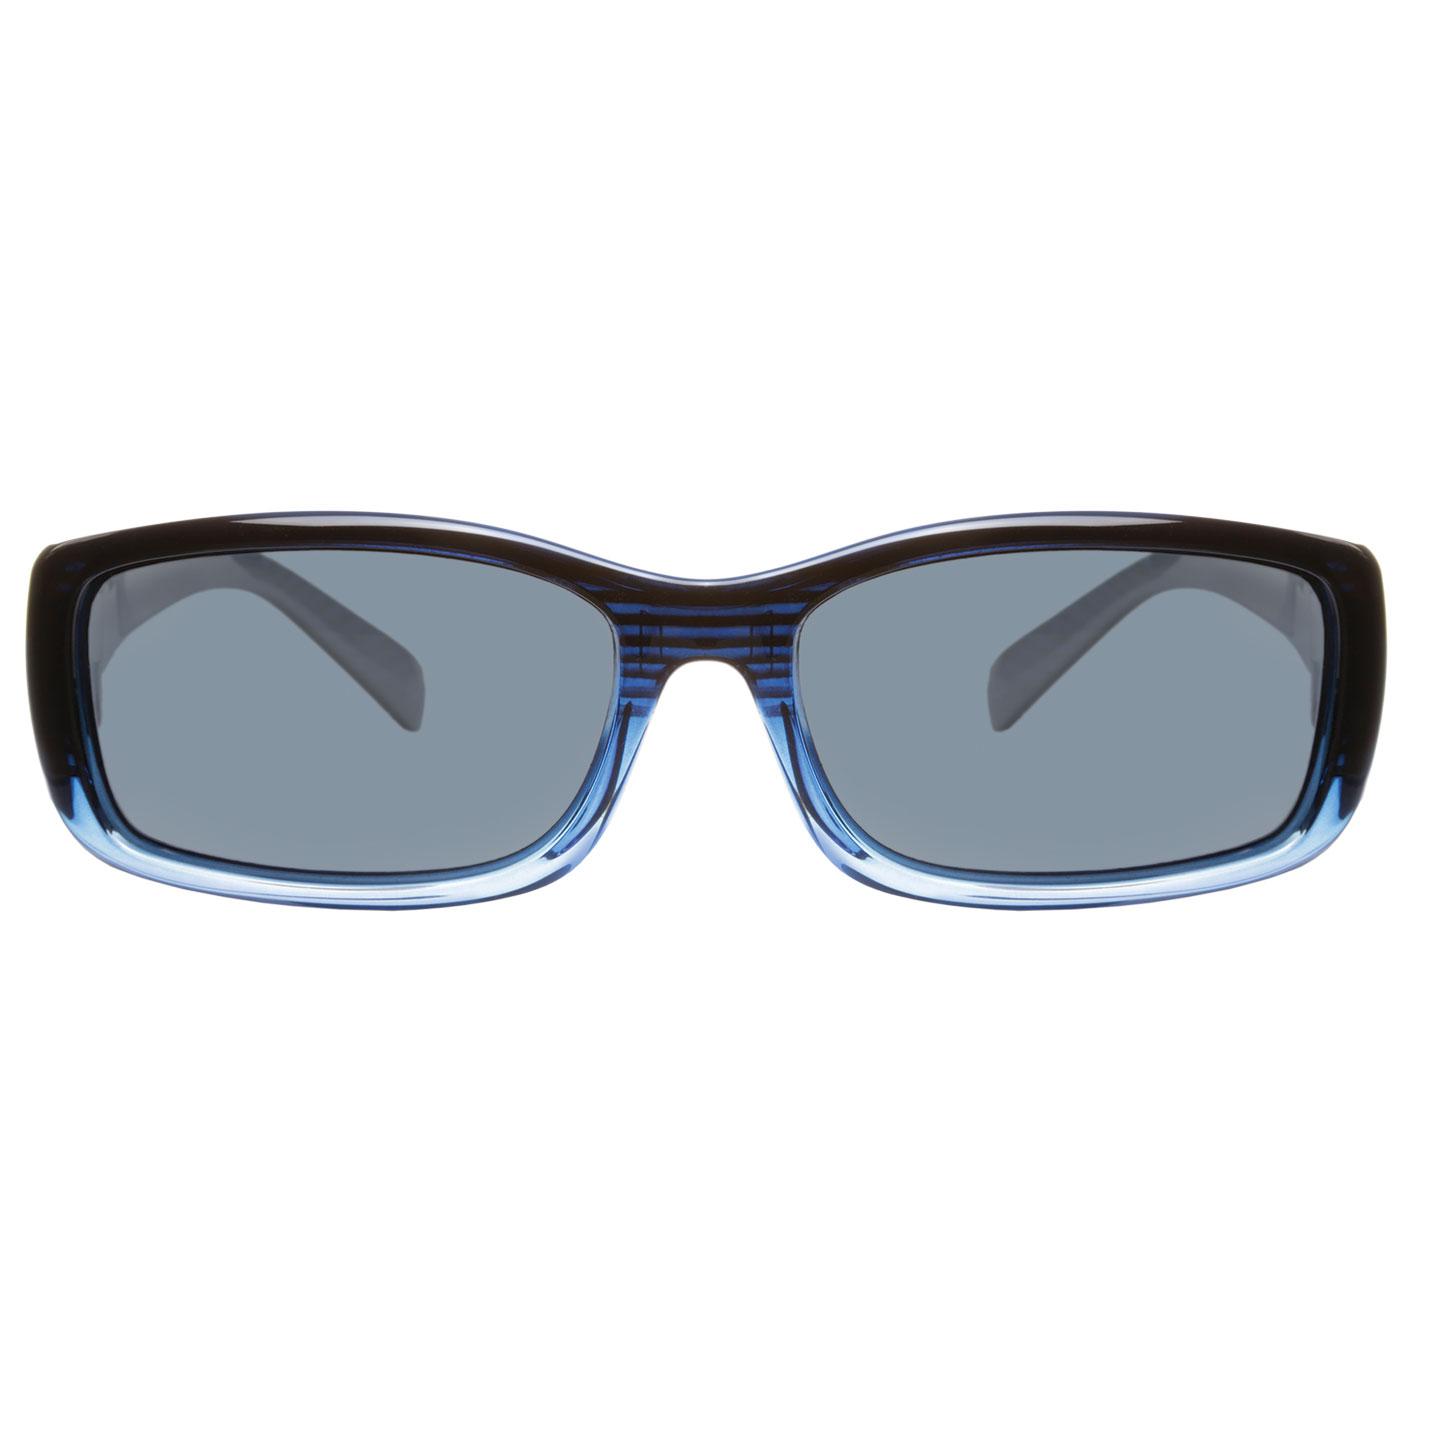 ac5529f7e6 Haven Fit Over Sunglasses-Freesia Faux Leather - Kleargo